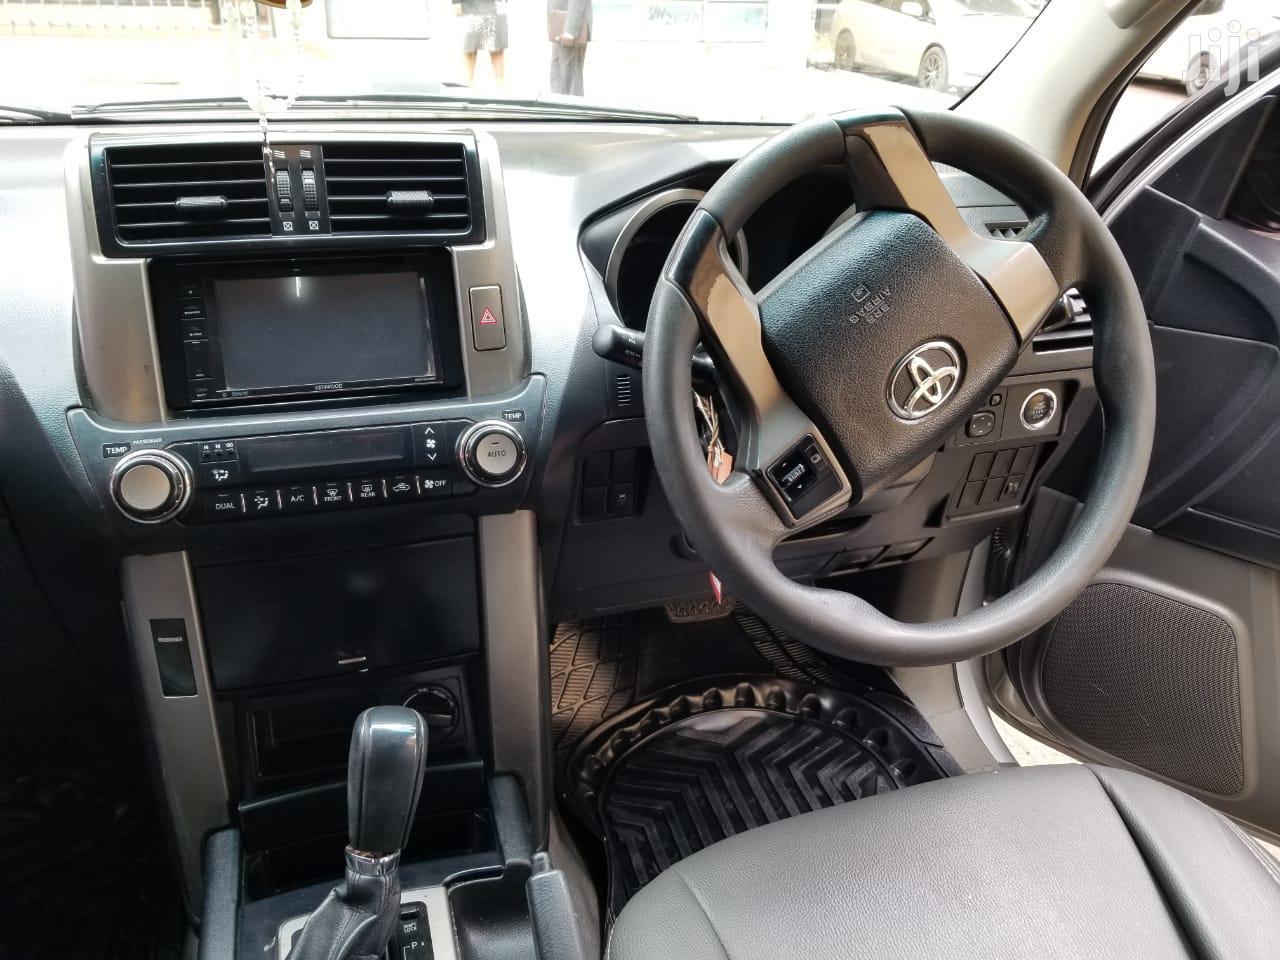 Toyota Land Cruiser Prado 2011 Silver | Cars for sale in Nairobi Central, Nairobi, Kenya